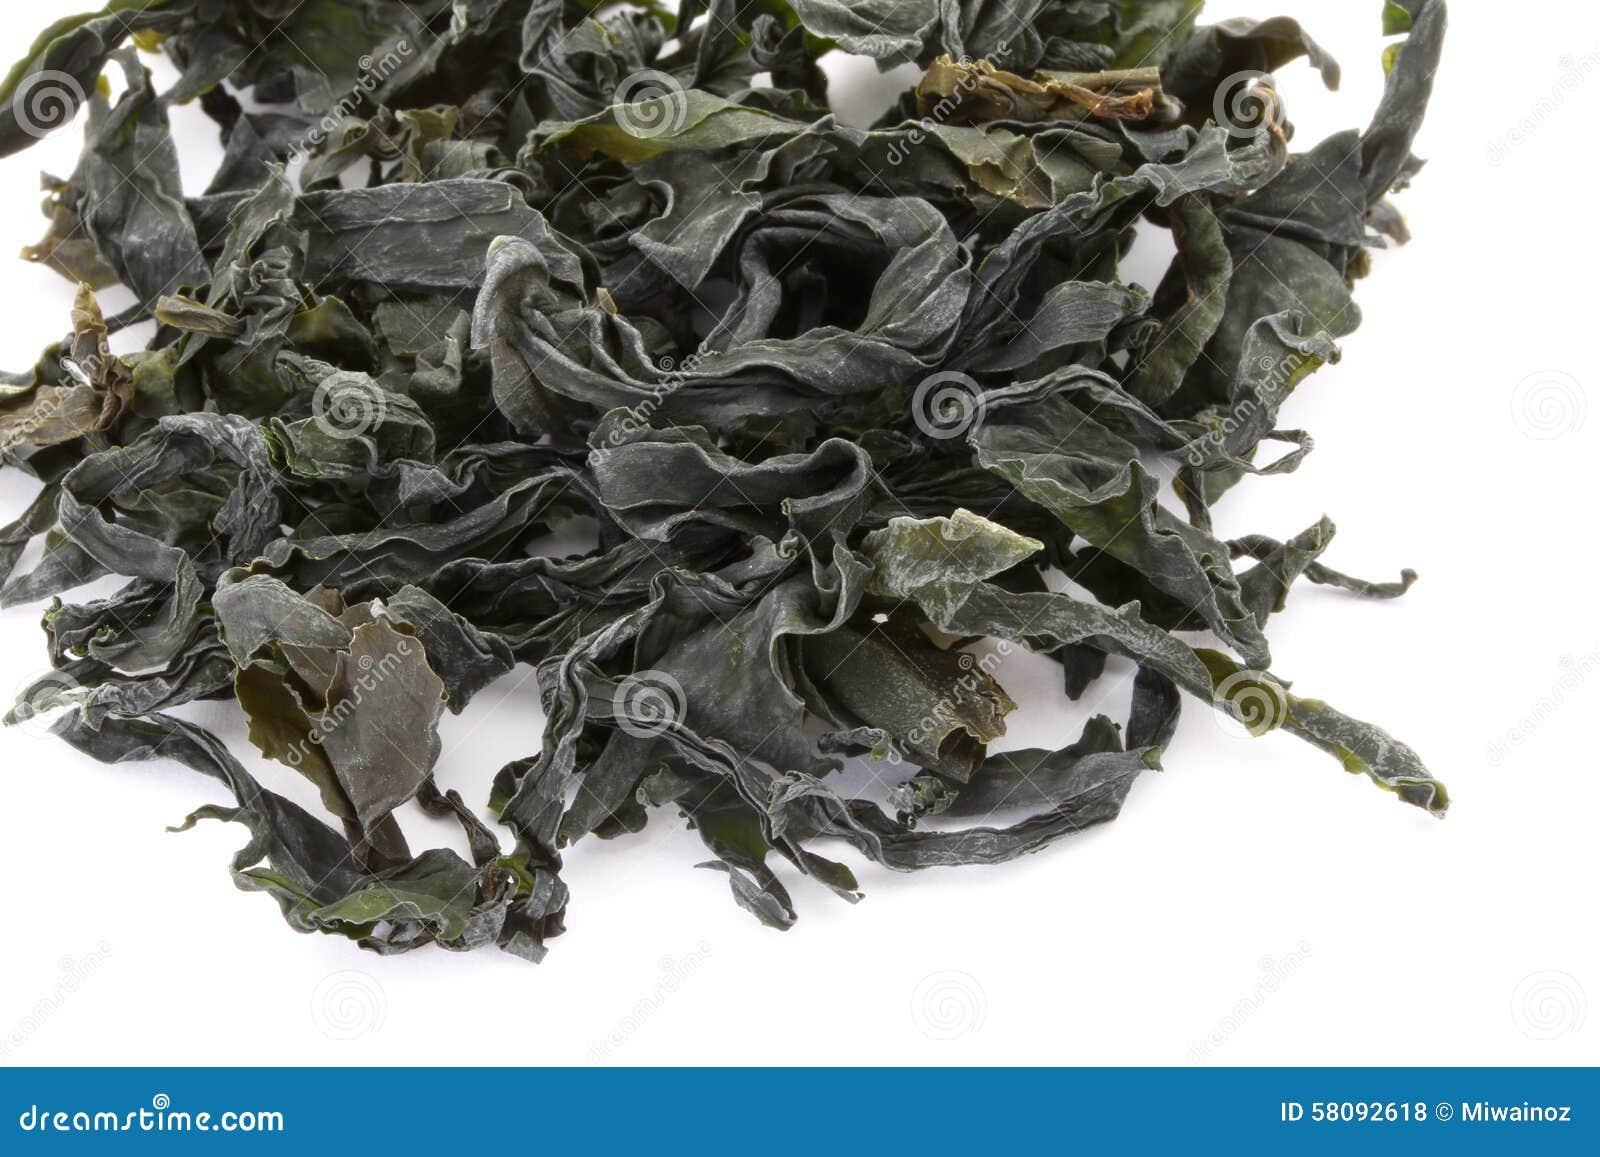 dried wakame